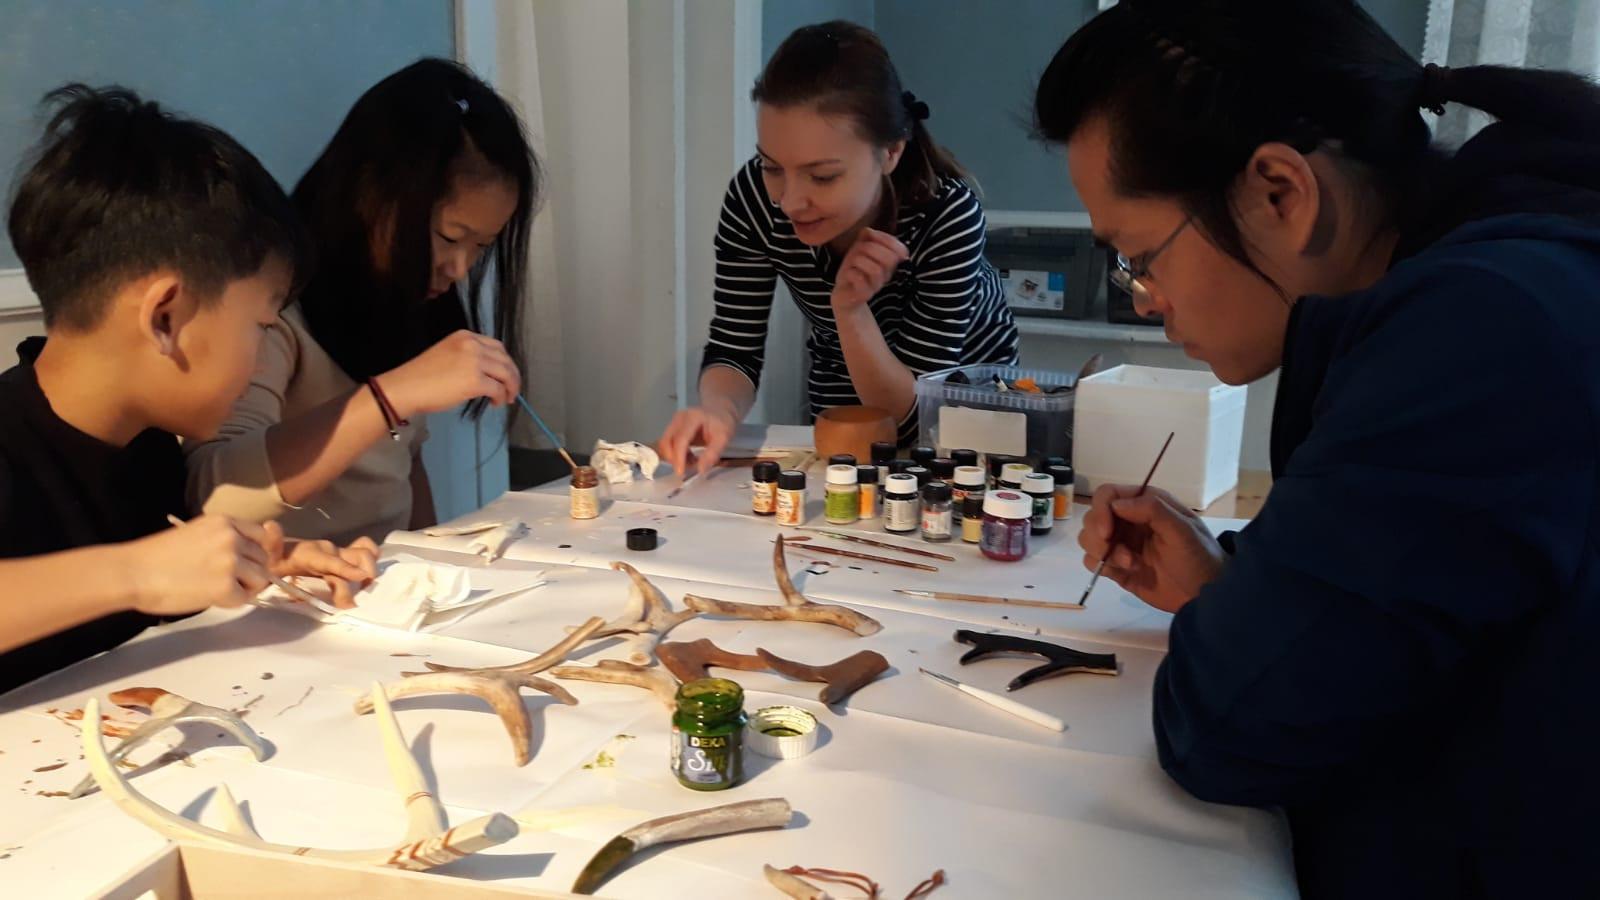 Lauri handcraft class 04.jpg